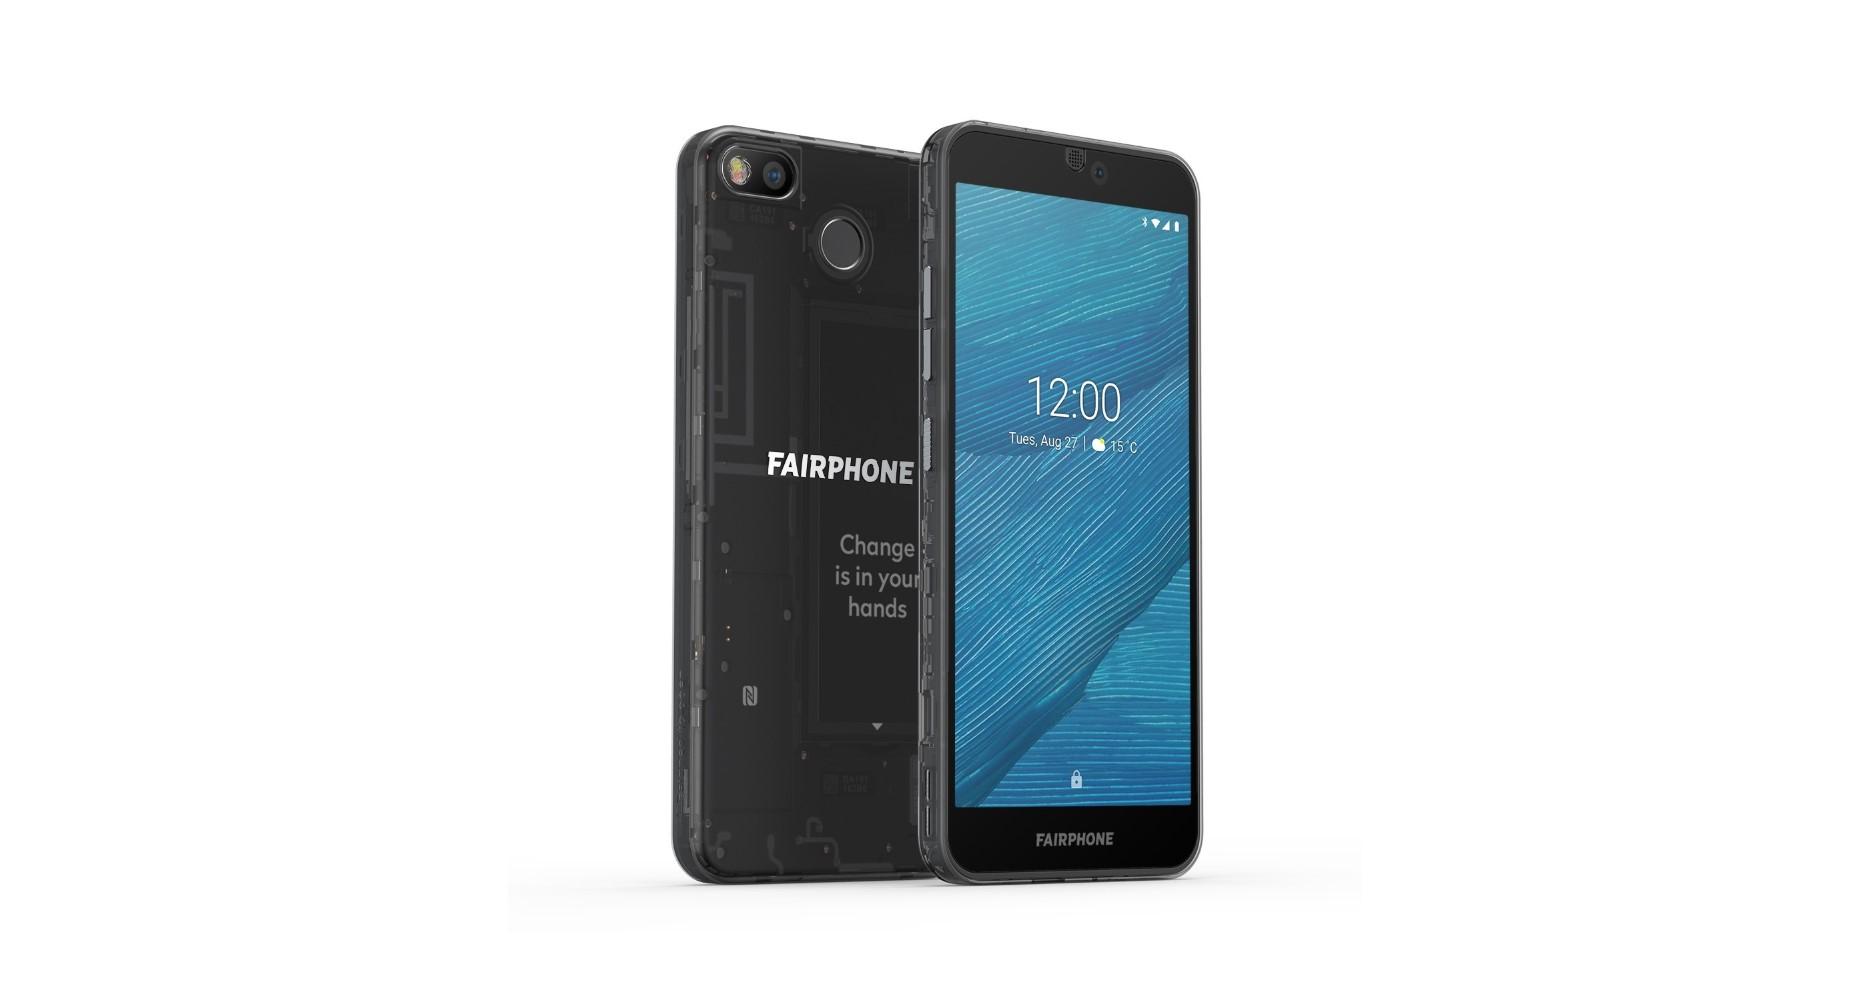 Novinka /e/OS Fairphone 3 nabídne ekologický telefon bez Google služeb